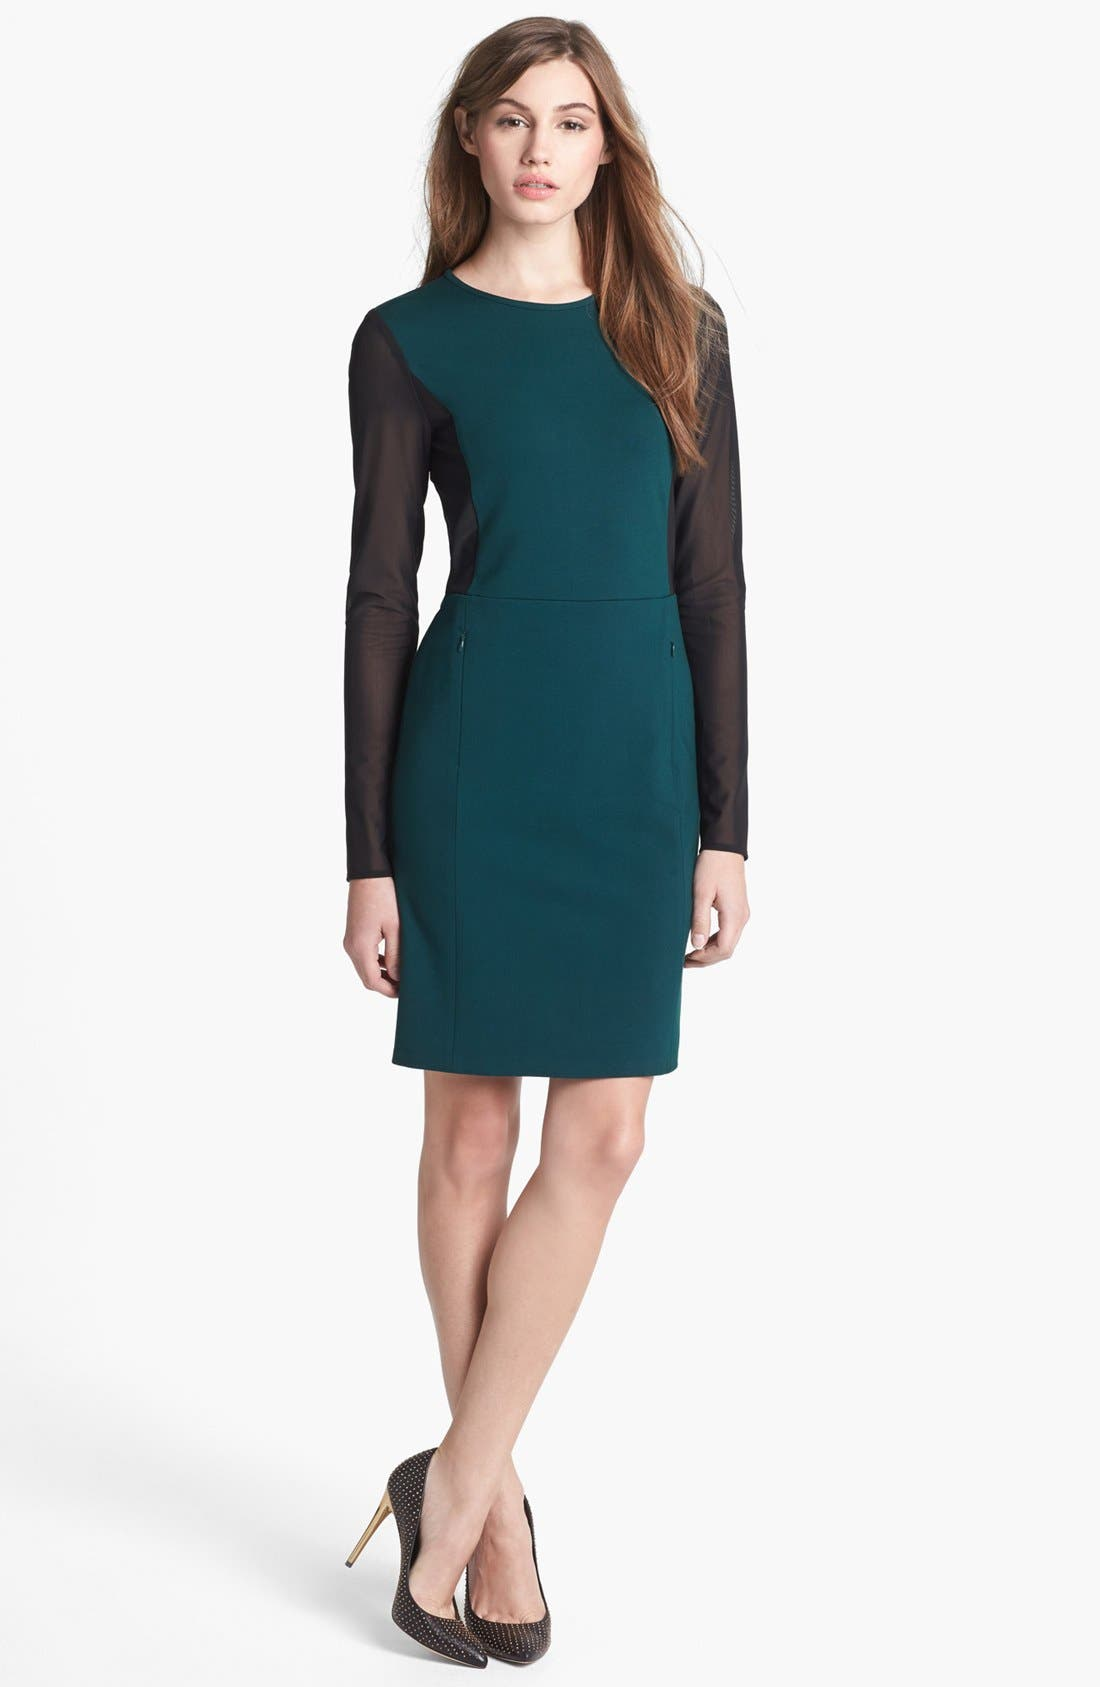 Main Image - Kenneth Cole New York 'Verrin' Dress